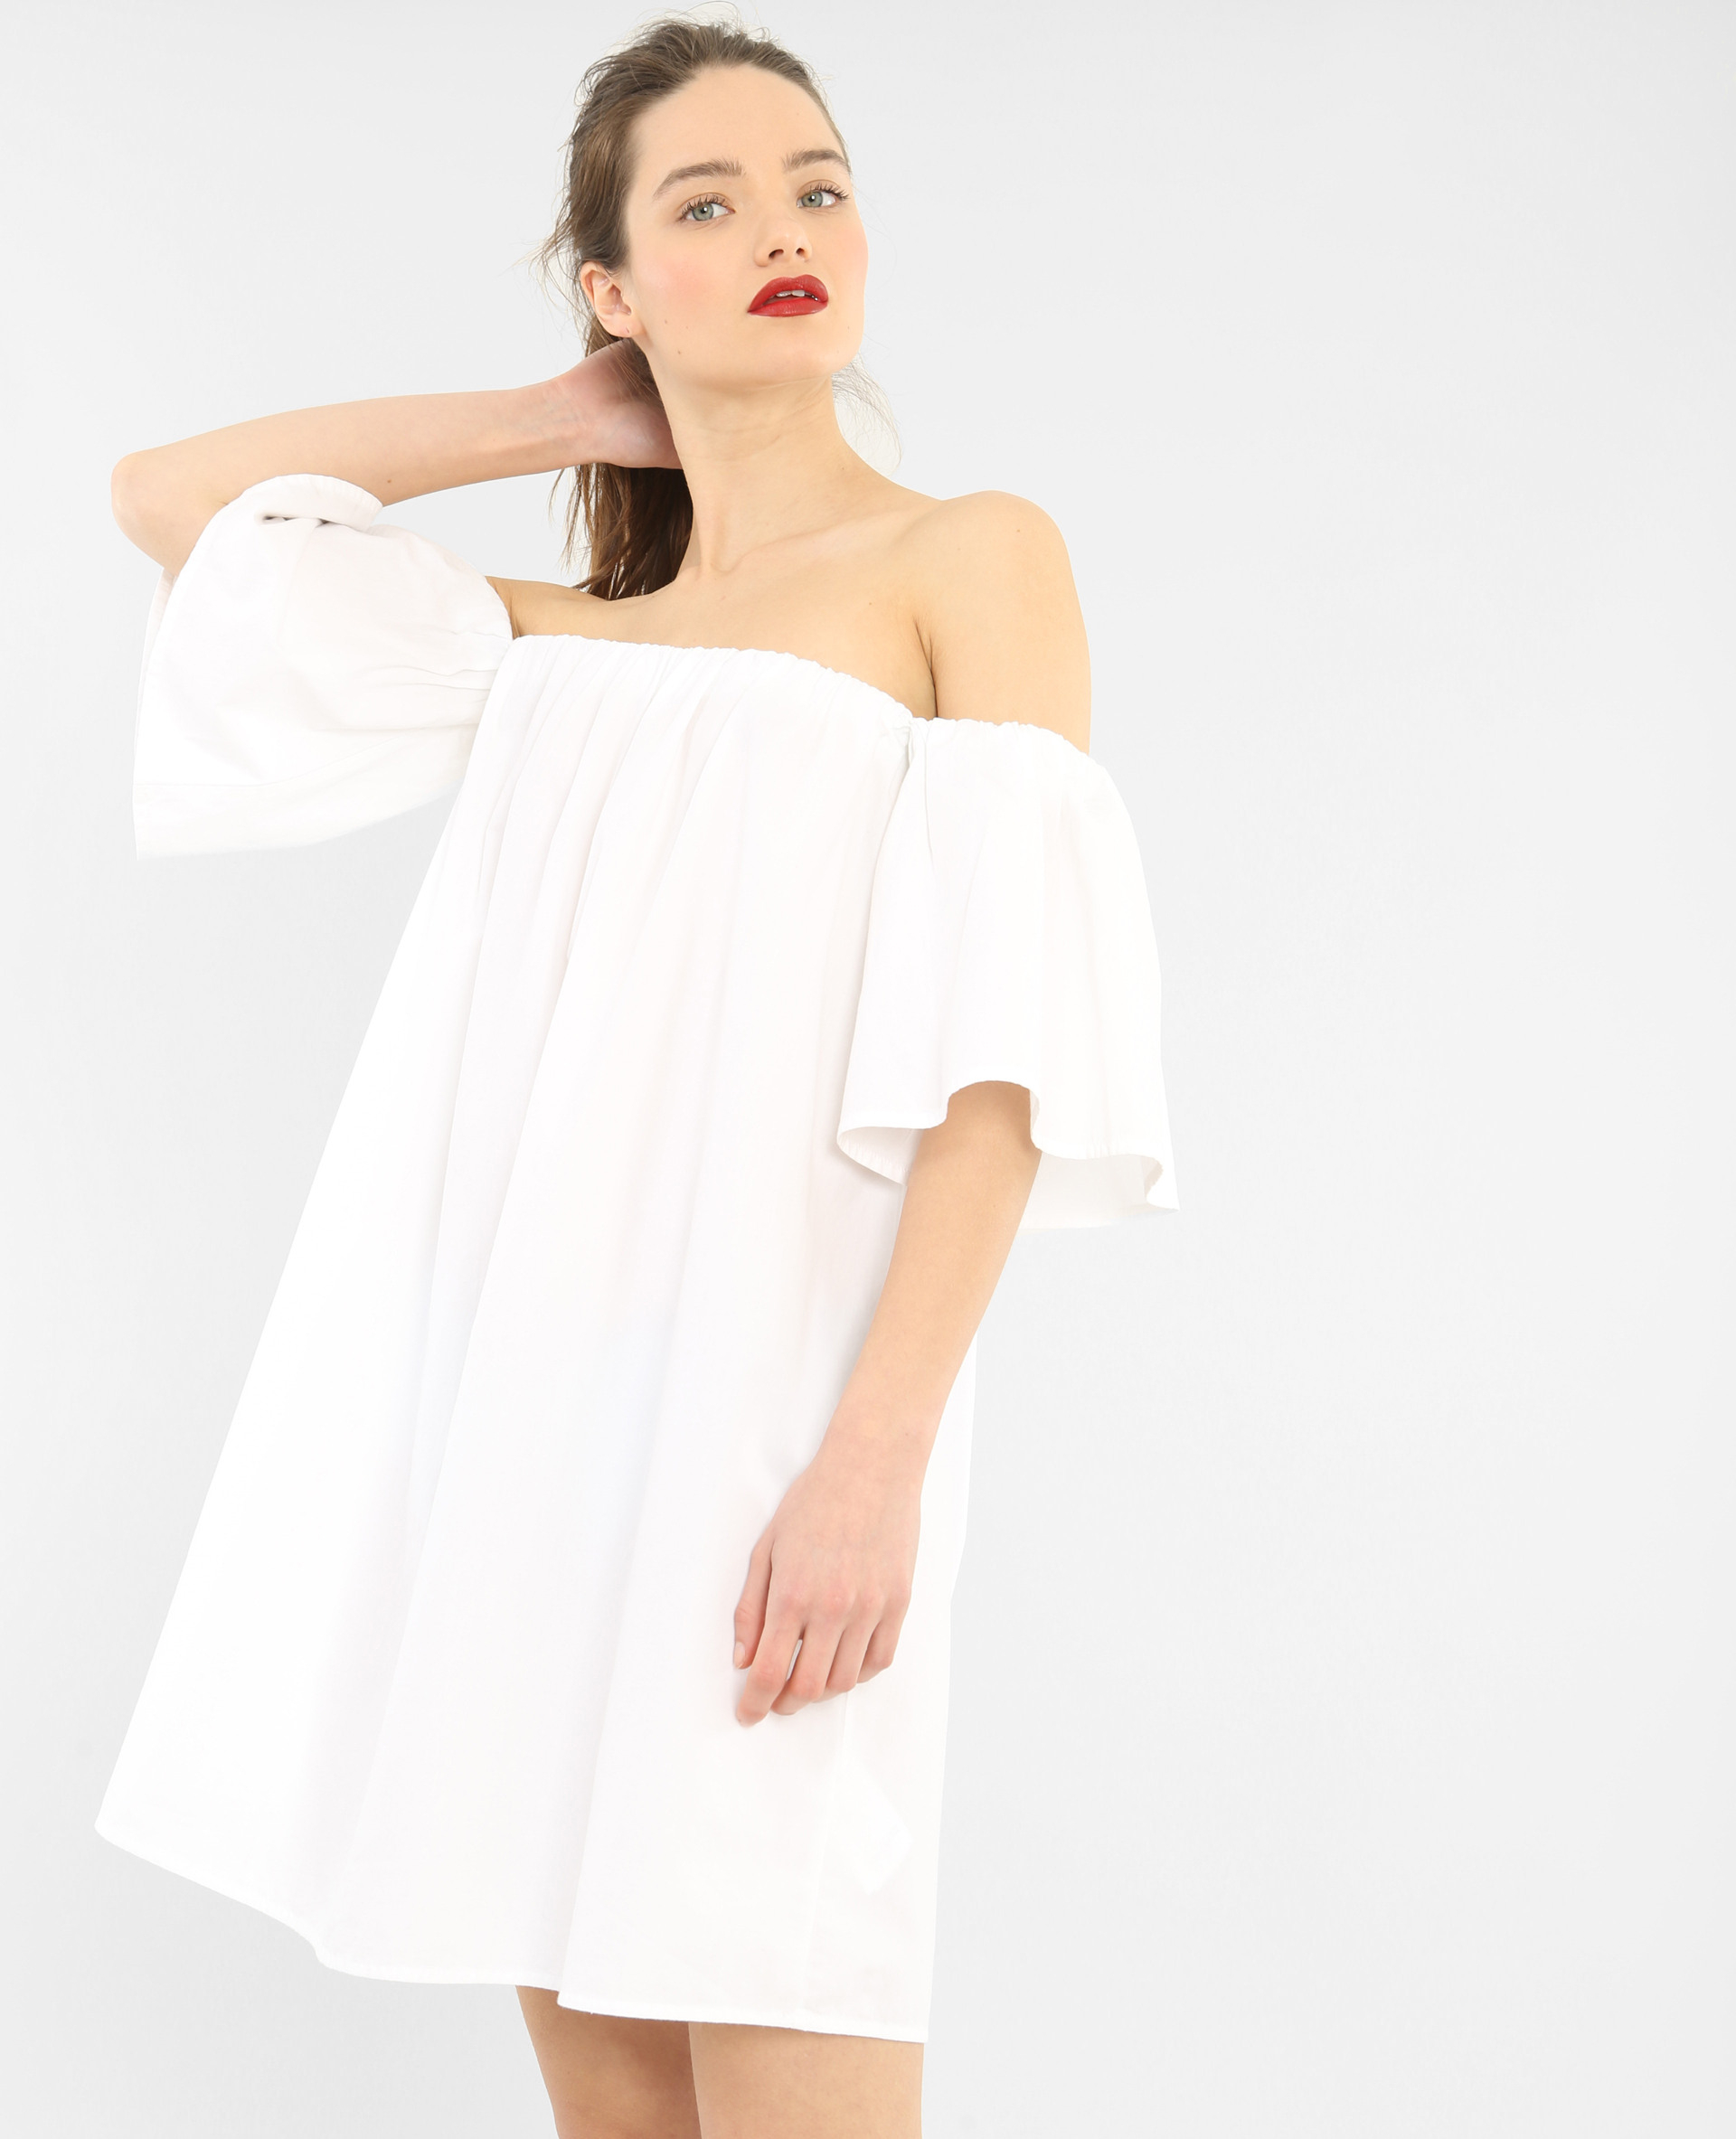 Robe Popeline Blanc  780658905A09  Pimkie